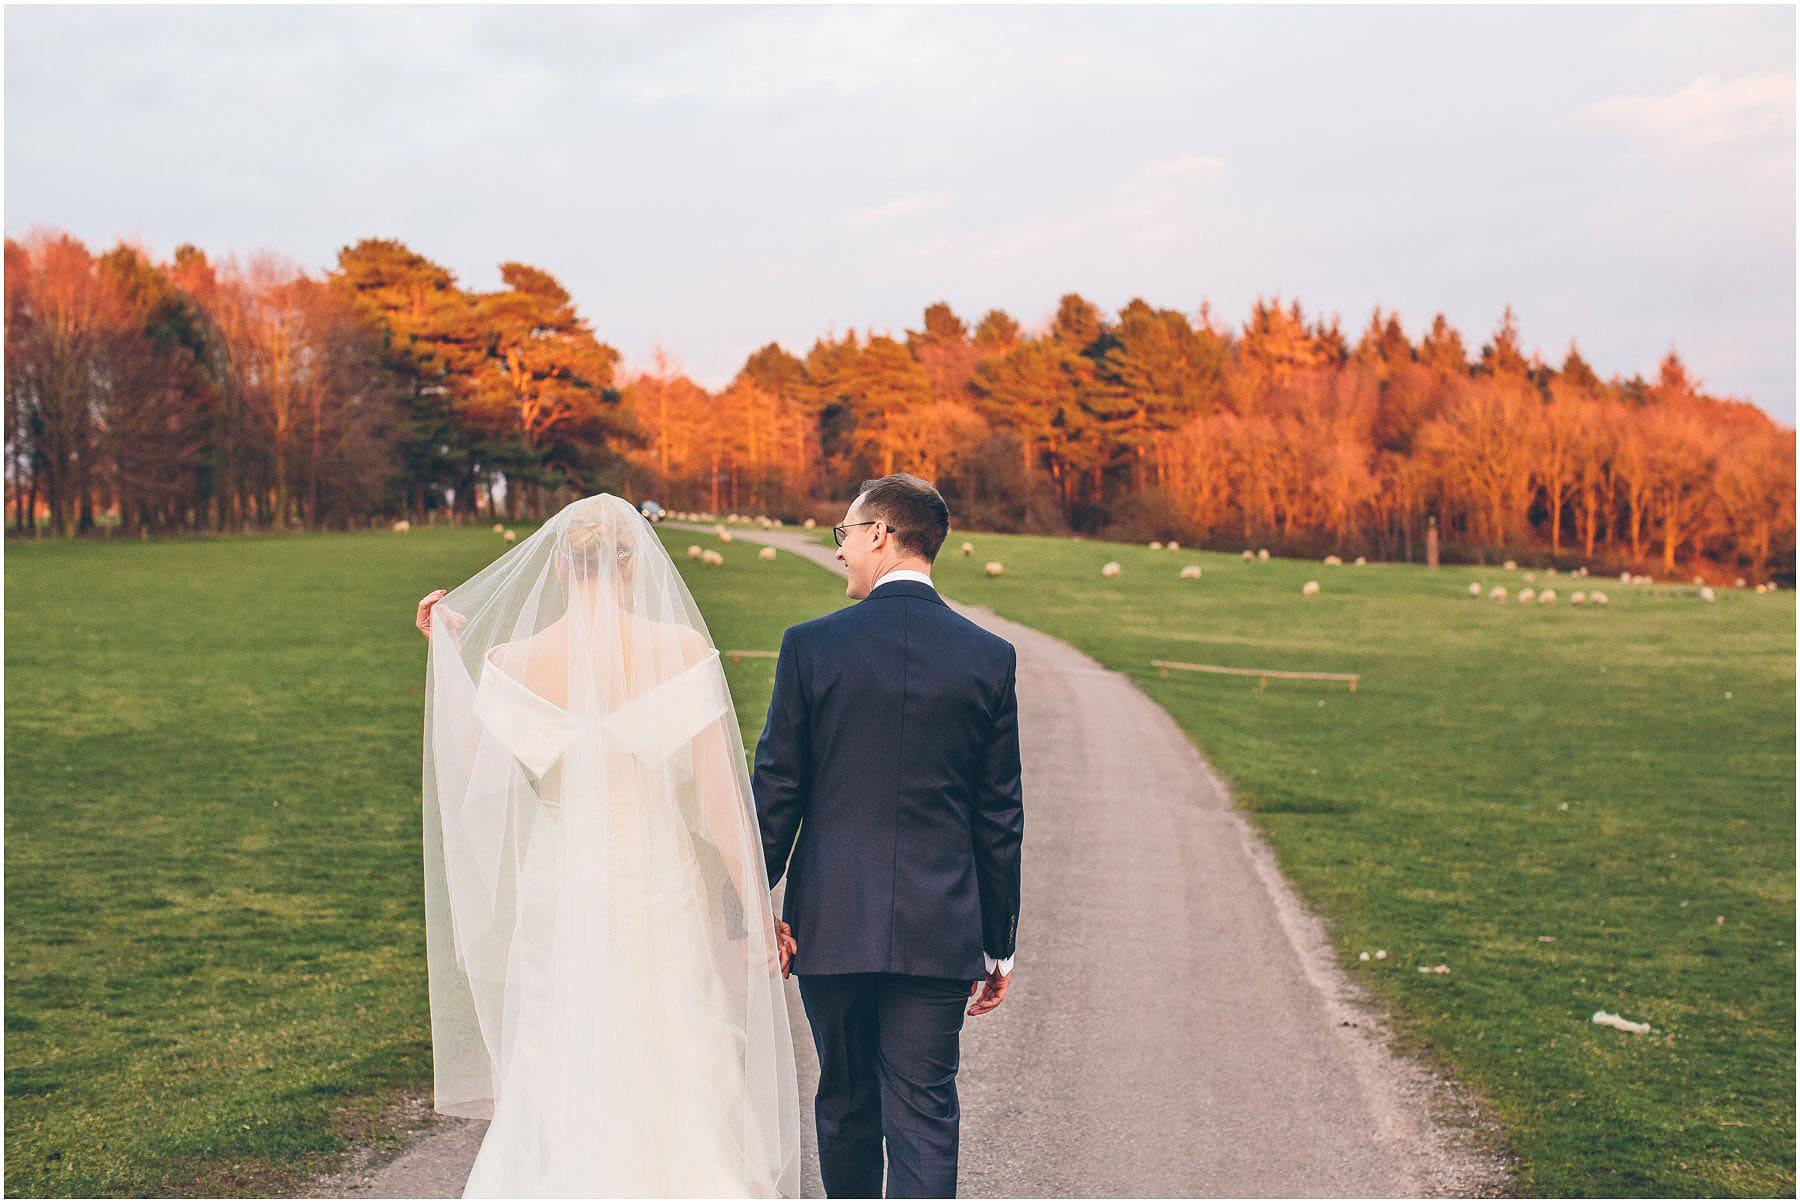 Capesthorne_Hall_Wedding_Photography_0130